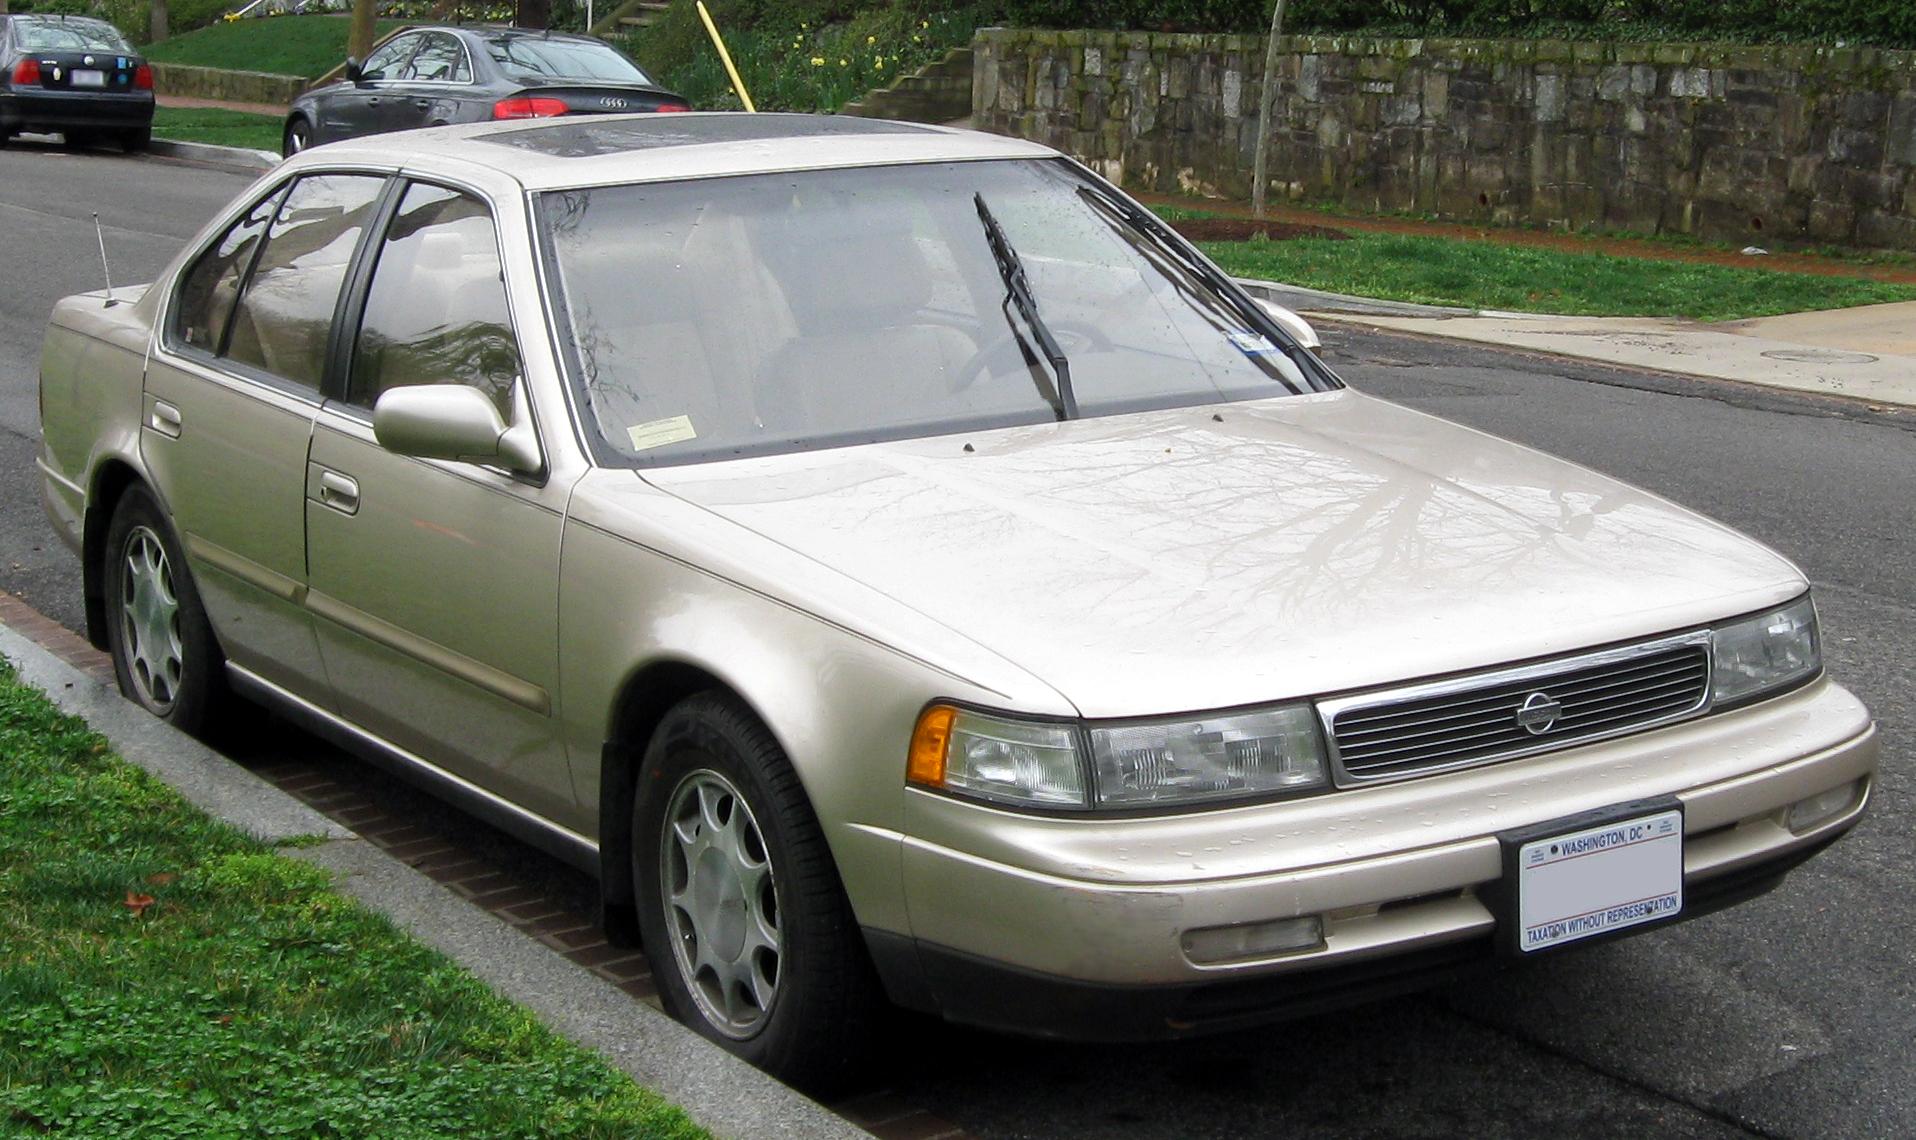 File19921994 Nissan Maxima  03212012JPG  Wikimedia Commons